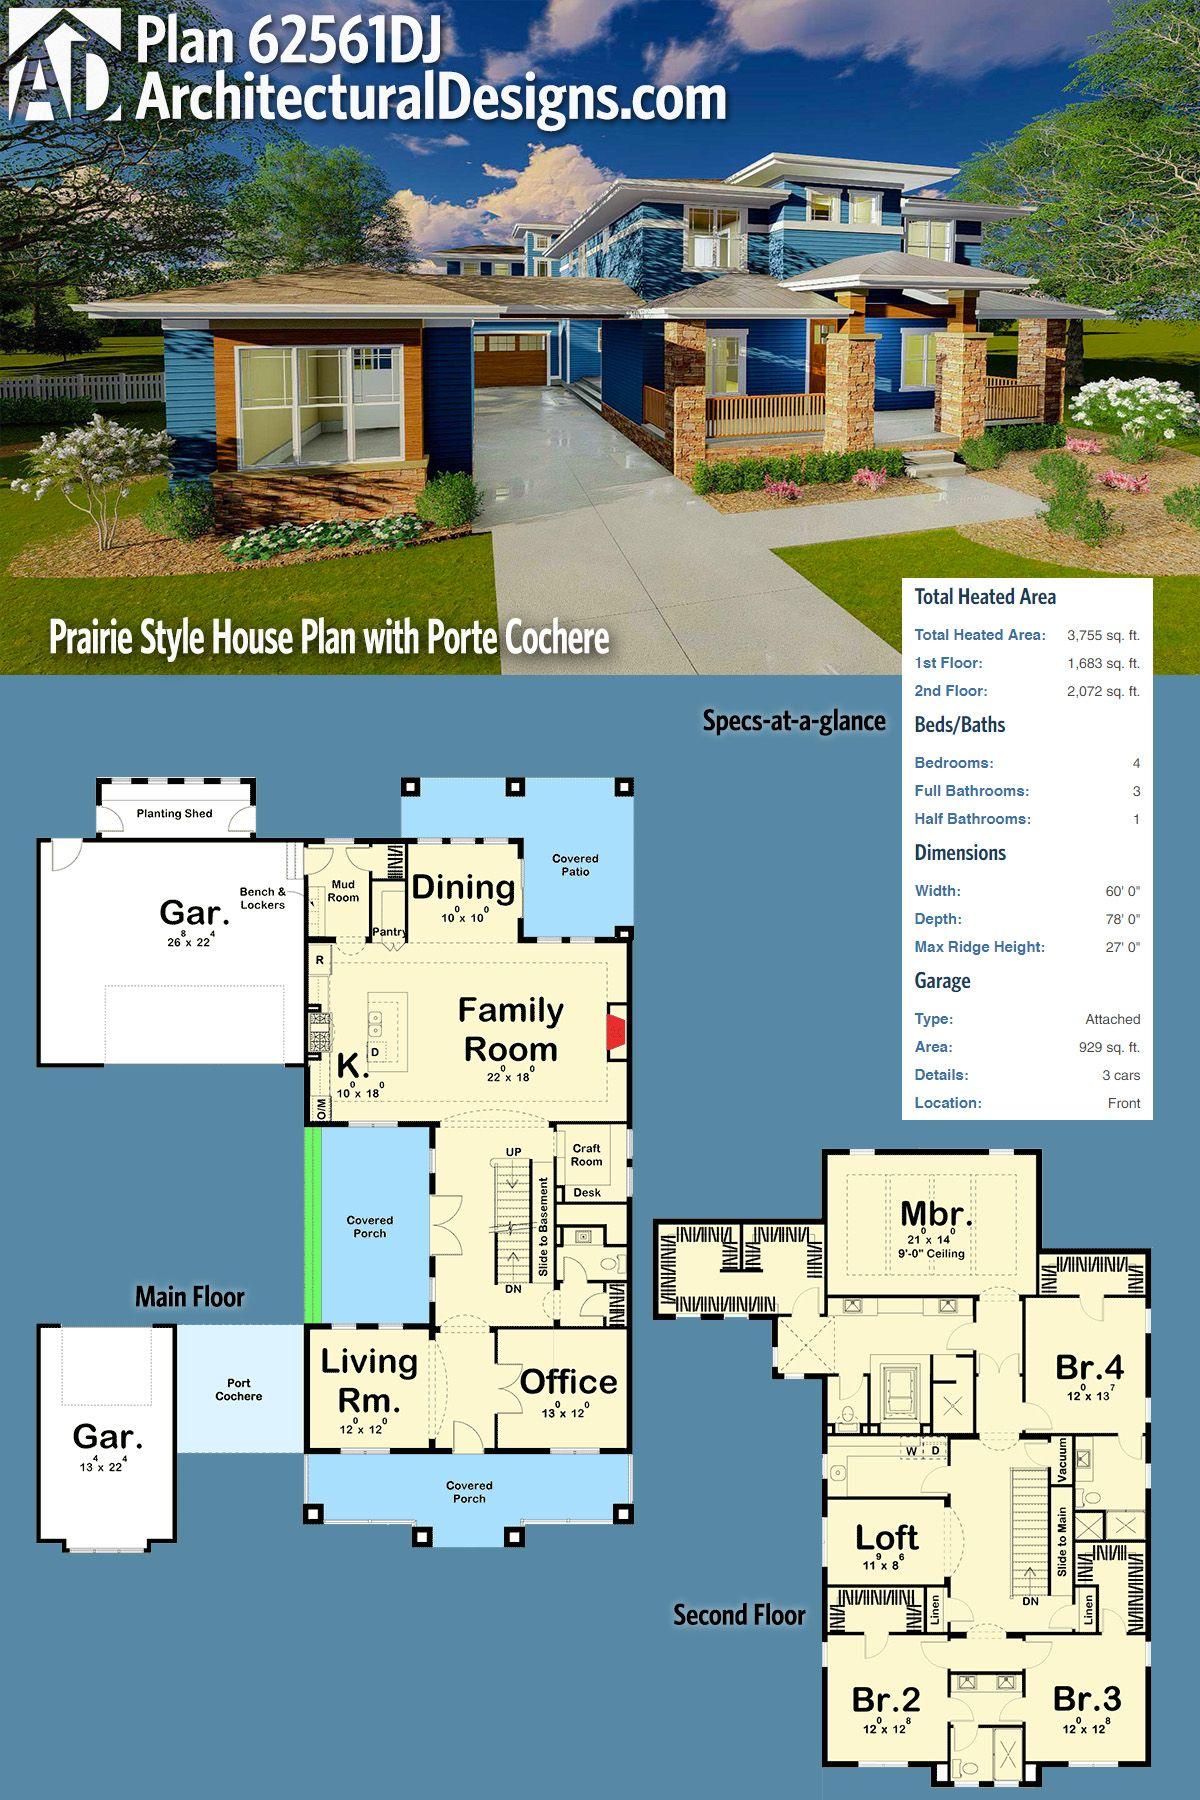 Plan DJ Prairie Style House Plan with Porte Cochere